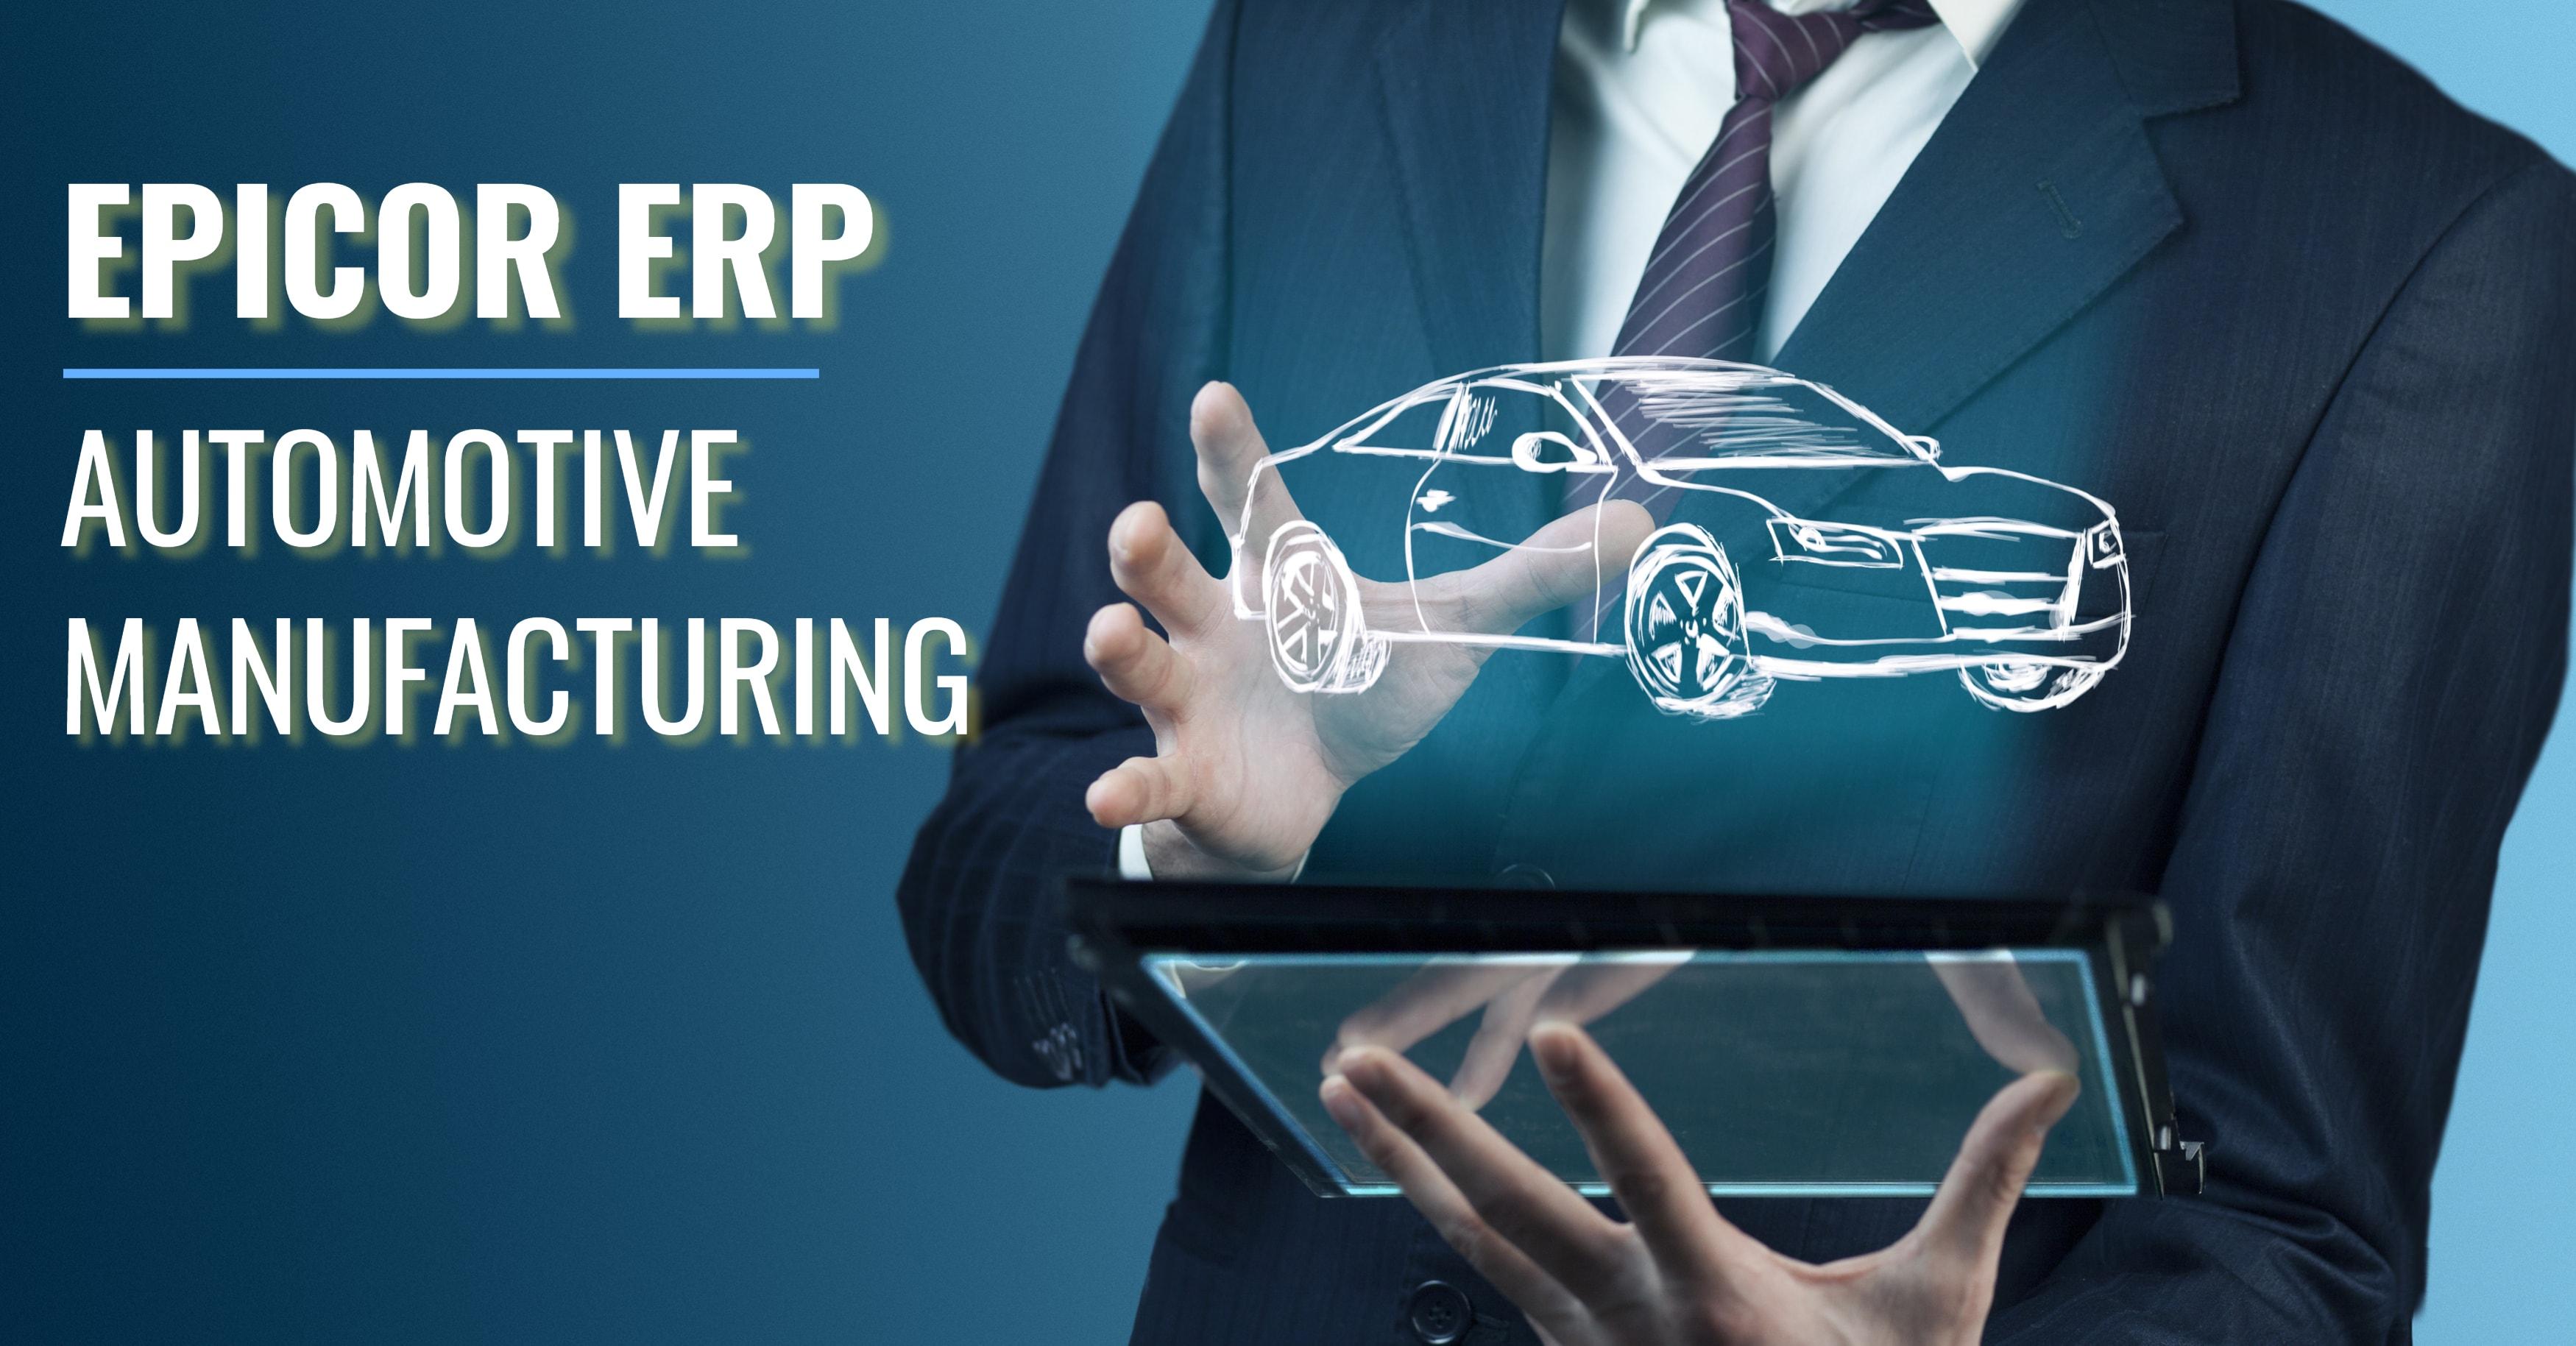 Epicor ERP Automotive Manufacturing